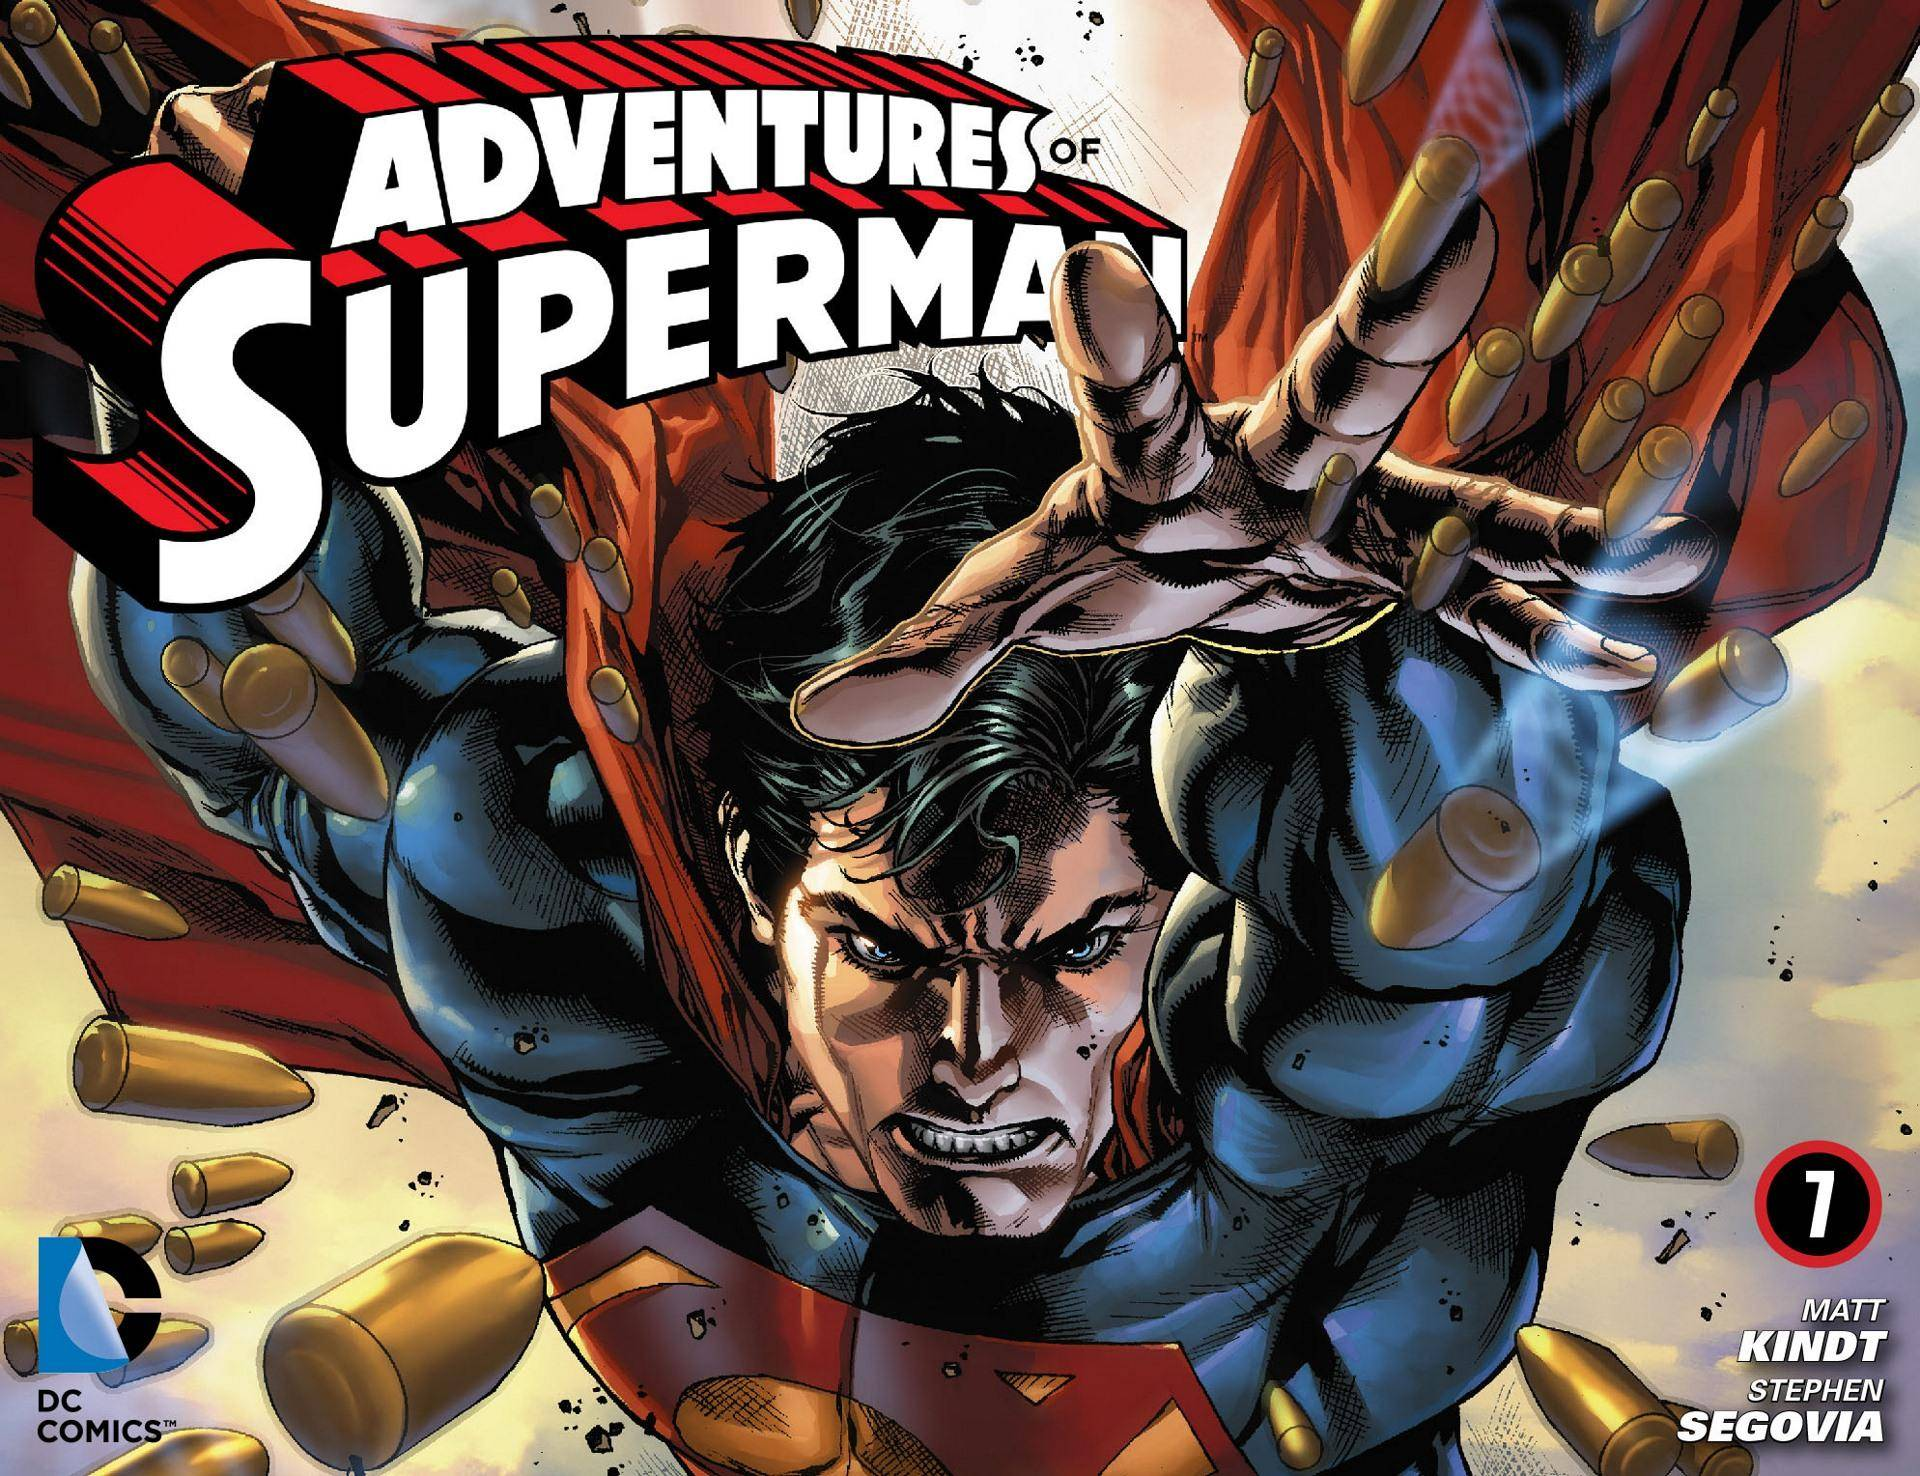 Adventures of Superman 007 2013 Digital